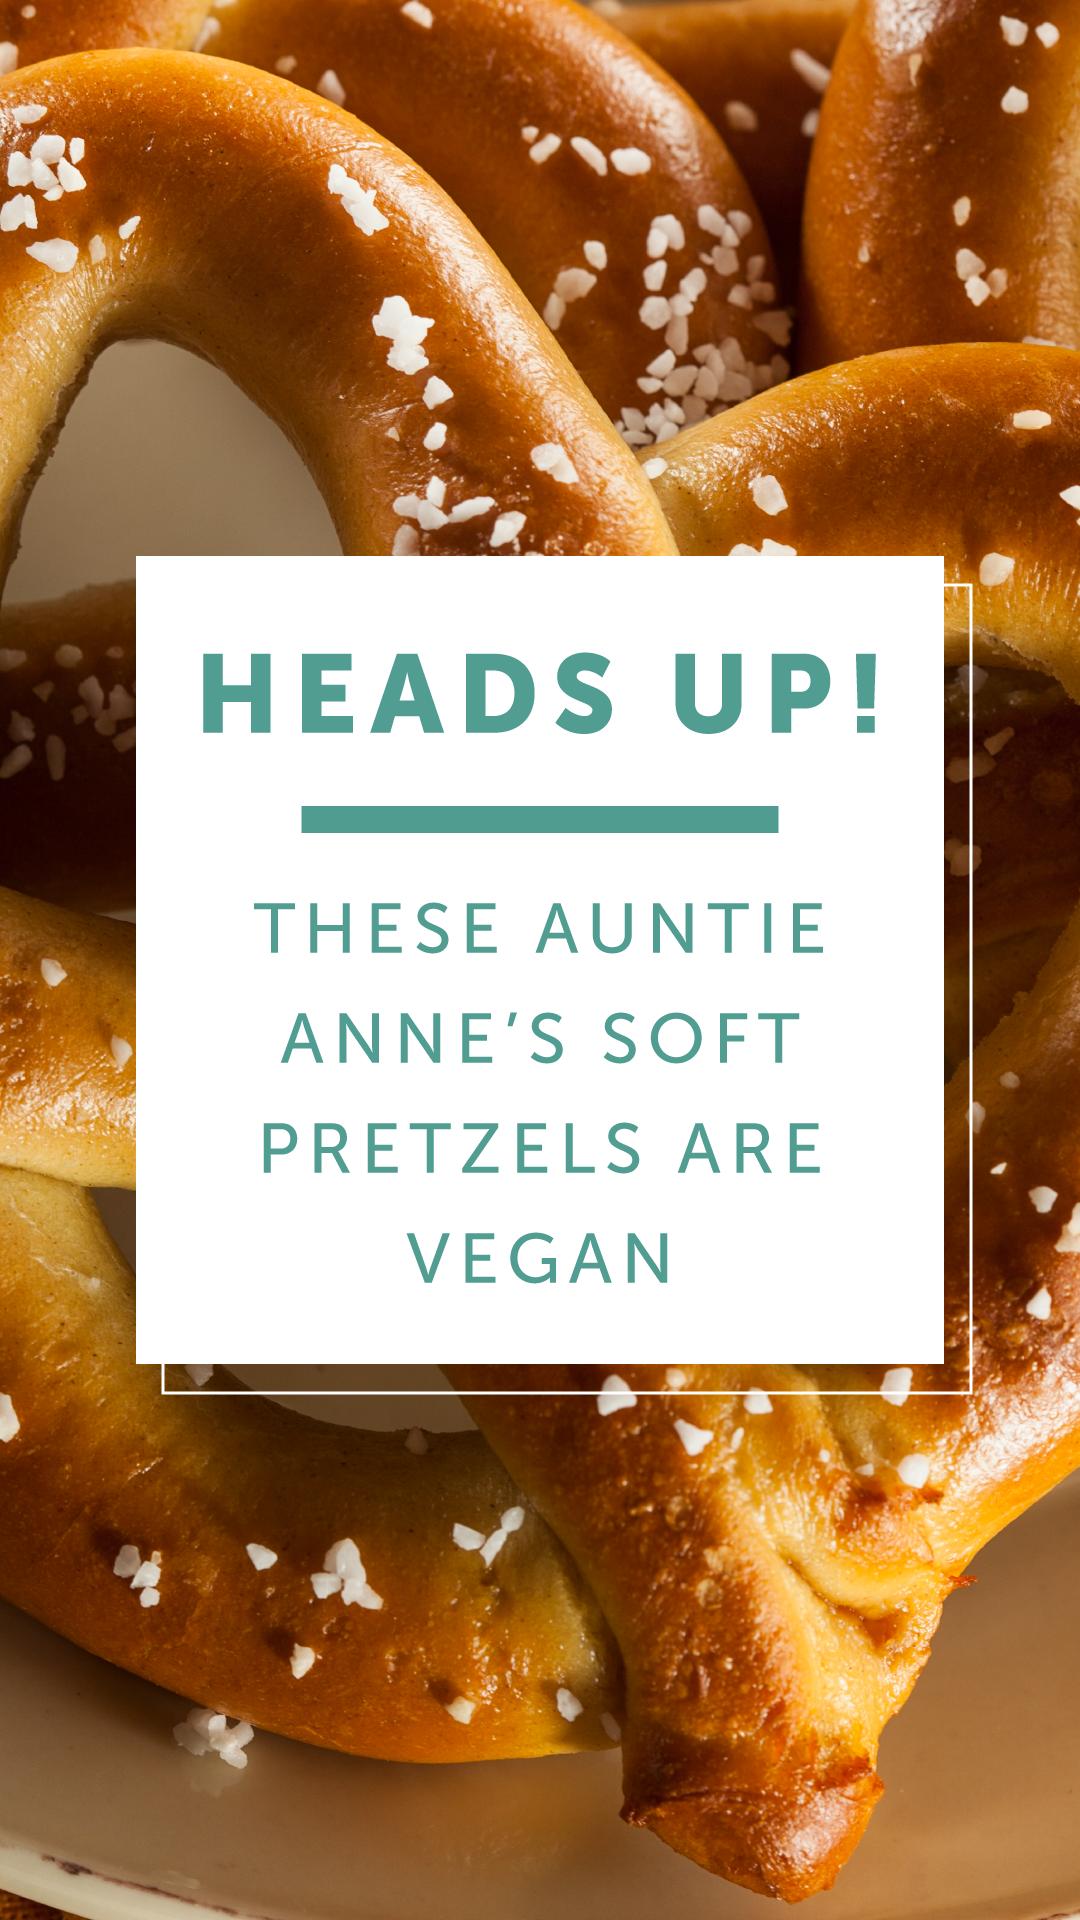 Heads Up These Auntie Anne S Soft Pretzels Are Vegan Chooseveg Vegan Soft Pretzel Recipe Vegan Pretzel Recipe Food